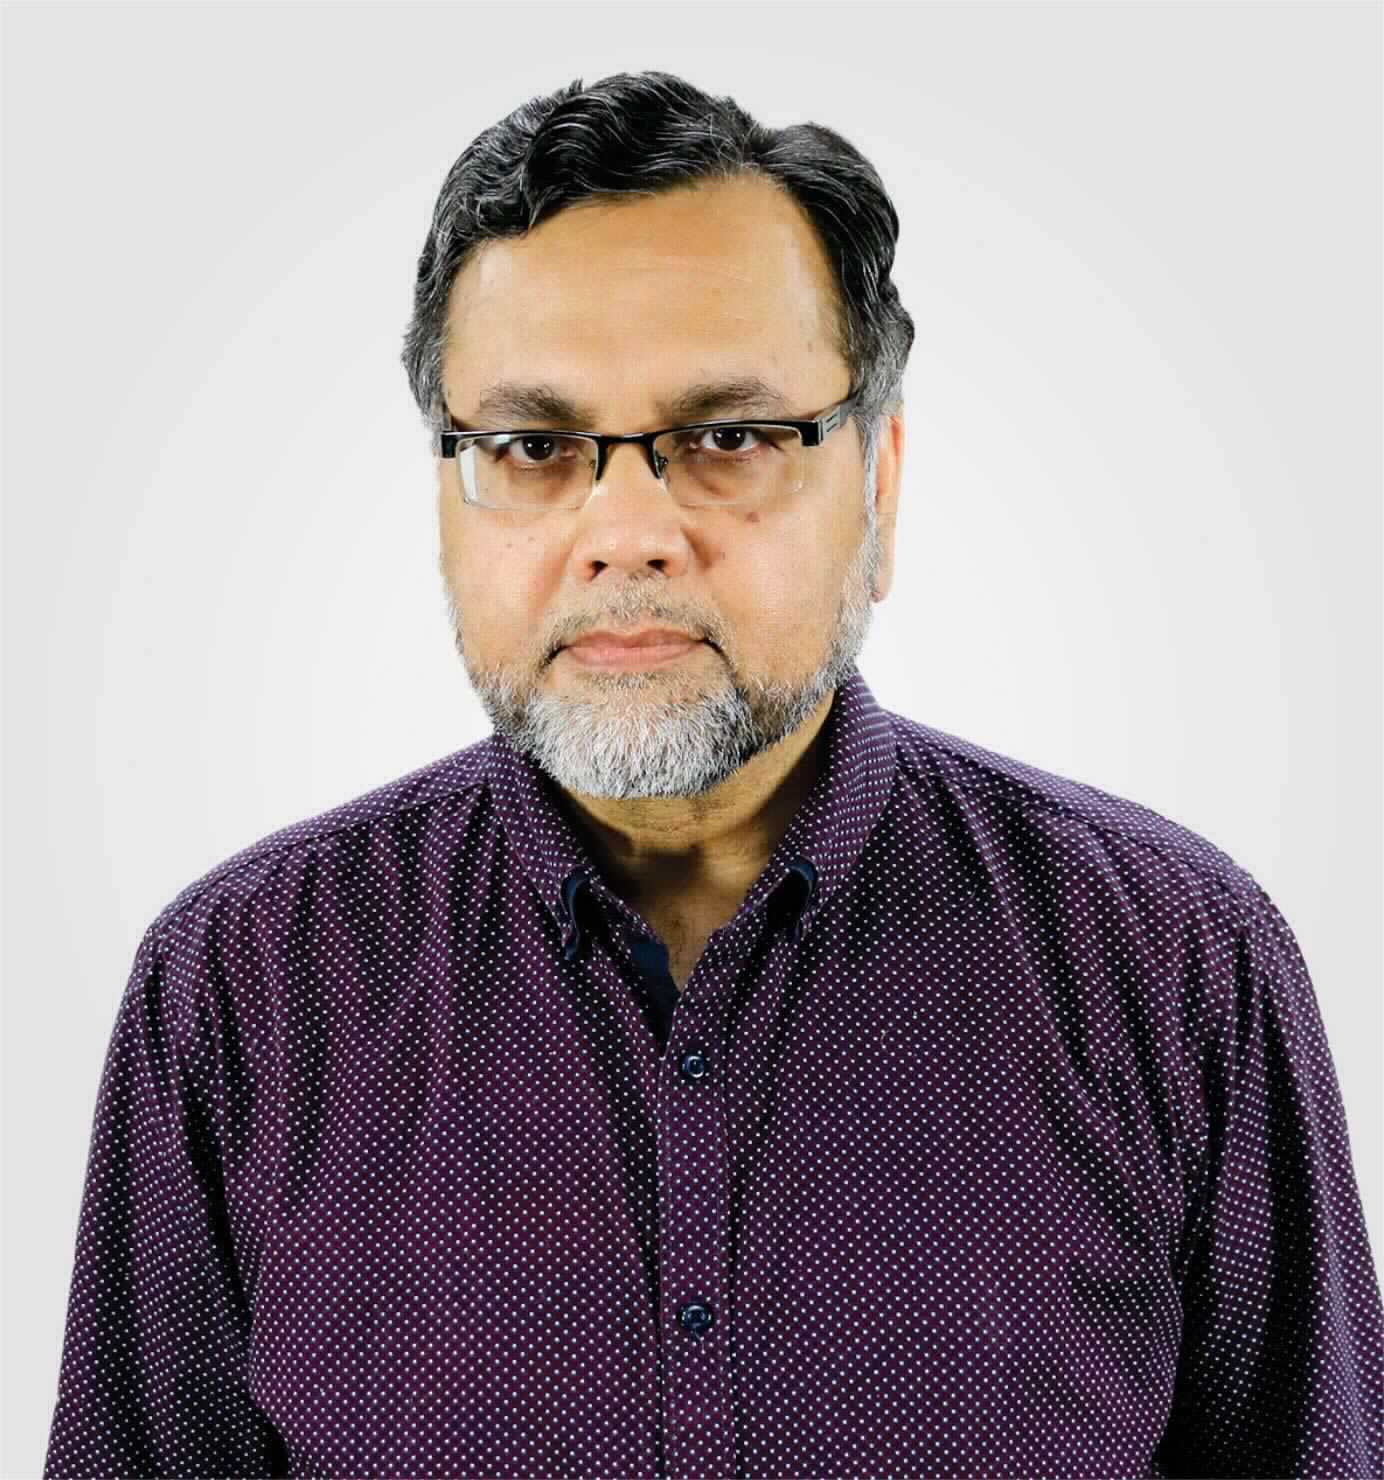 Faizan Ahmad